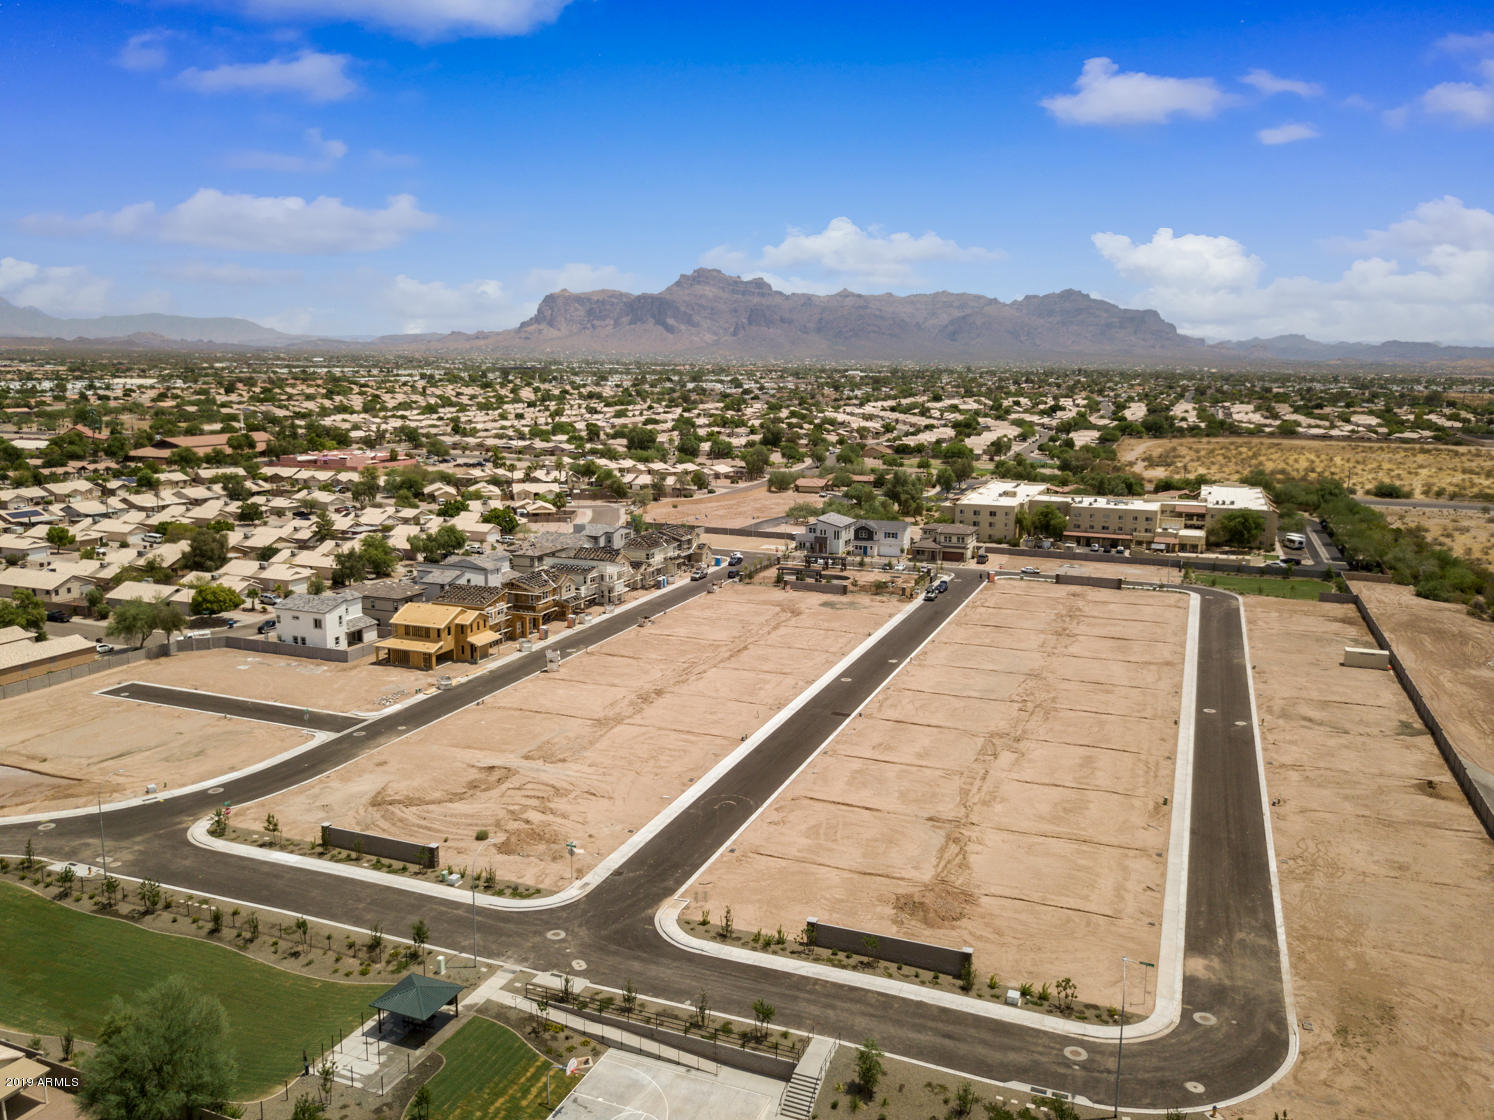 MLS 5921303 1869 W 20th Avenue, Apache Junction, AZ 85120 Apache Junction AZ Gated